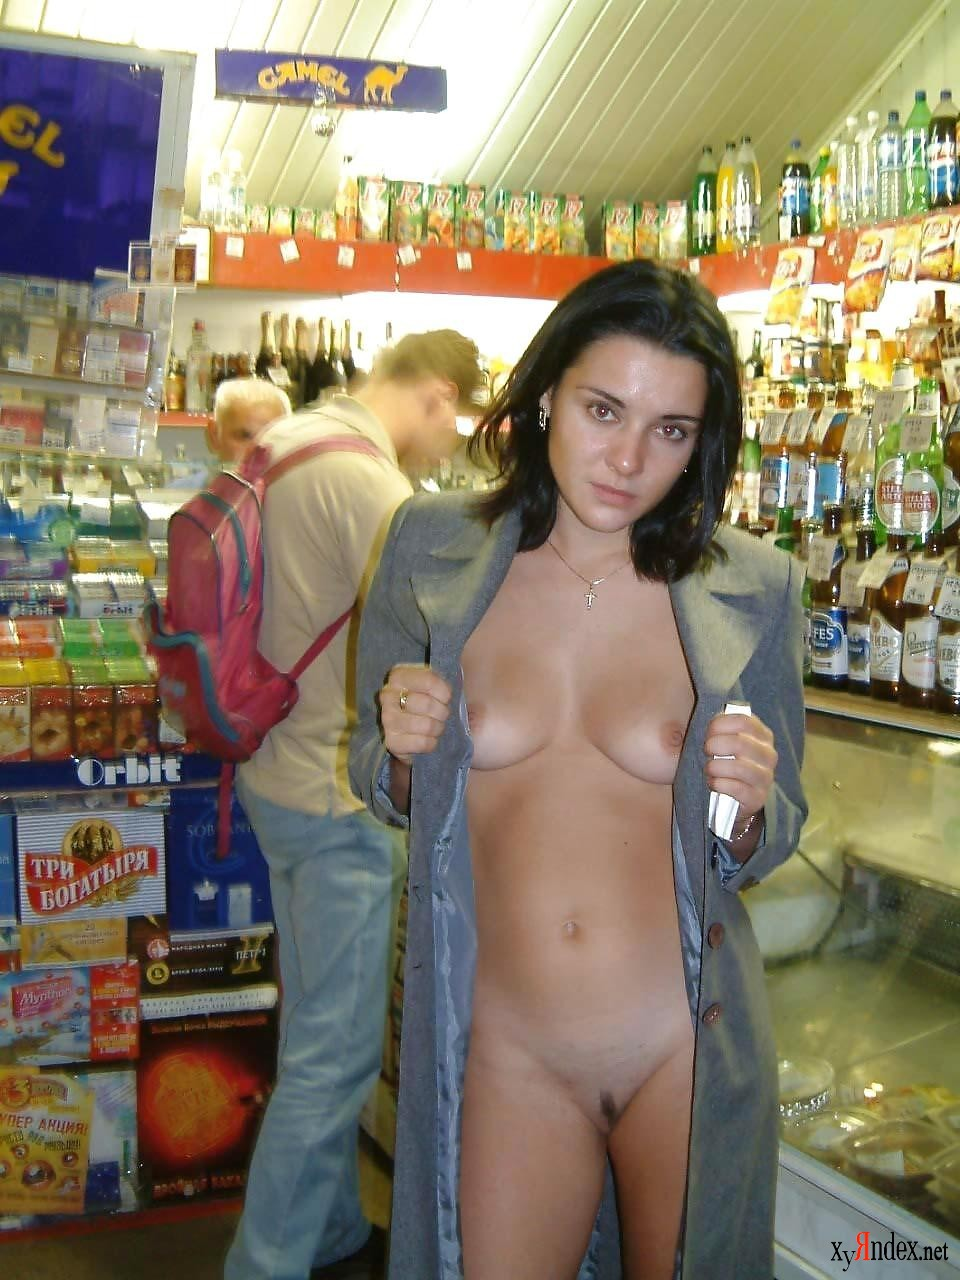 Nude flash girl domination porn pics